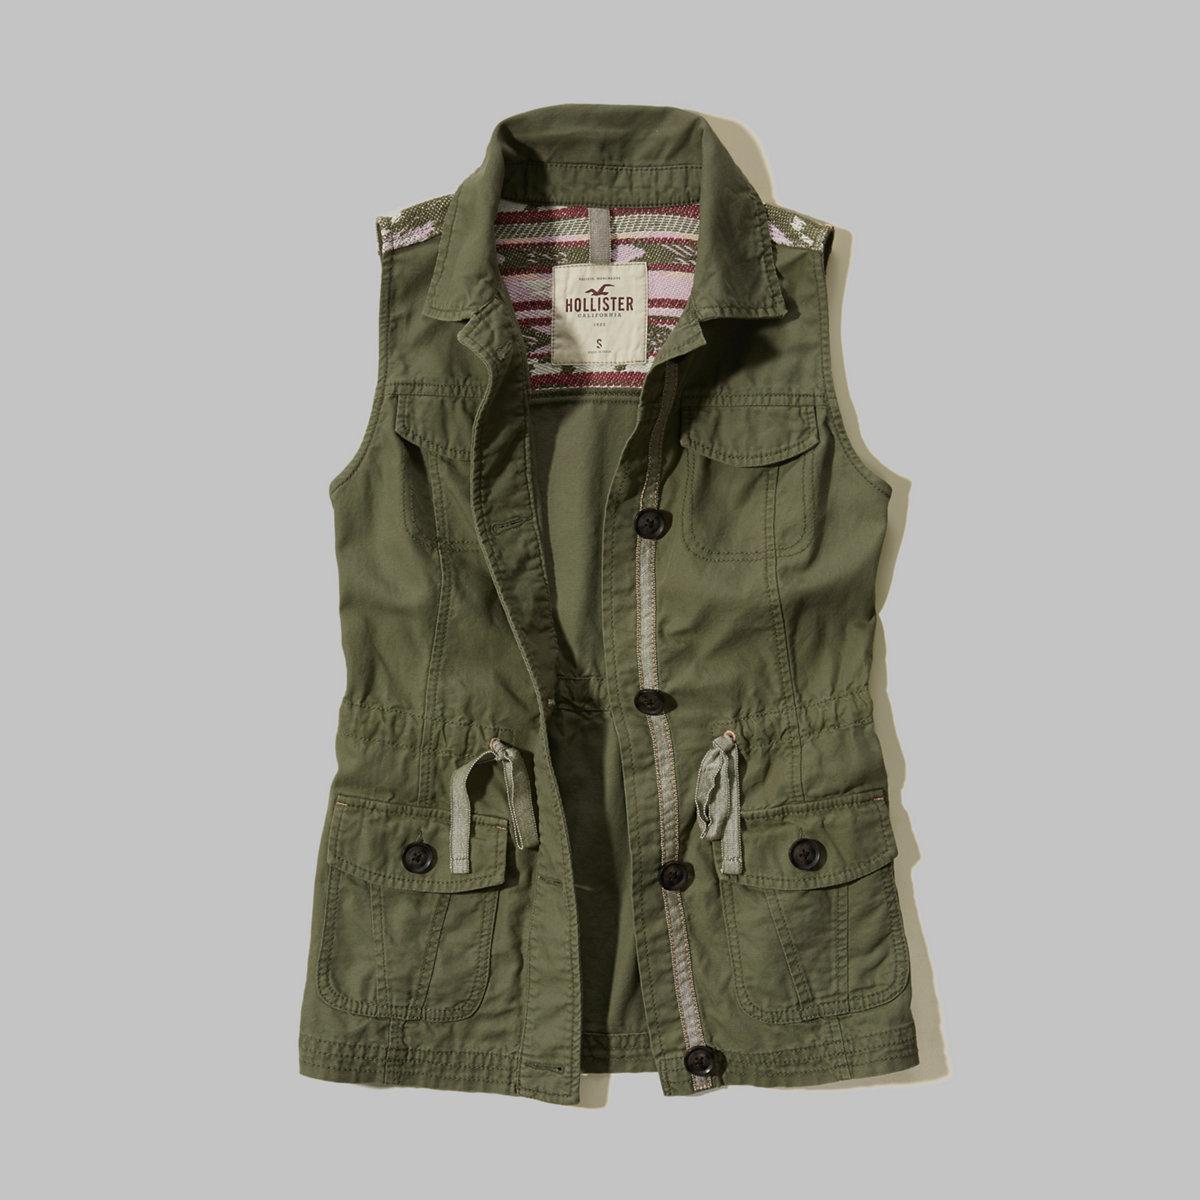 Patterned Military Vest